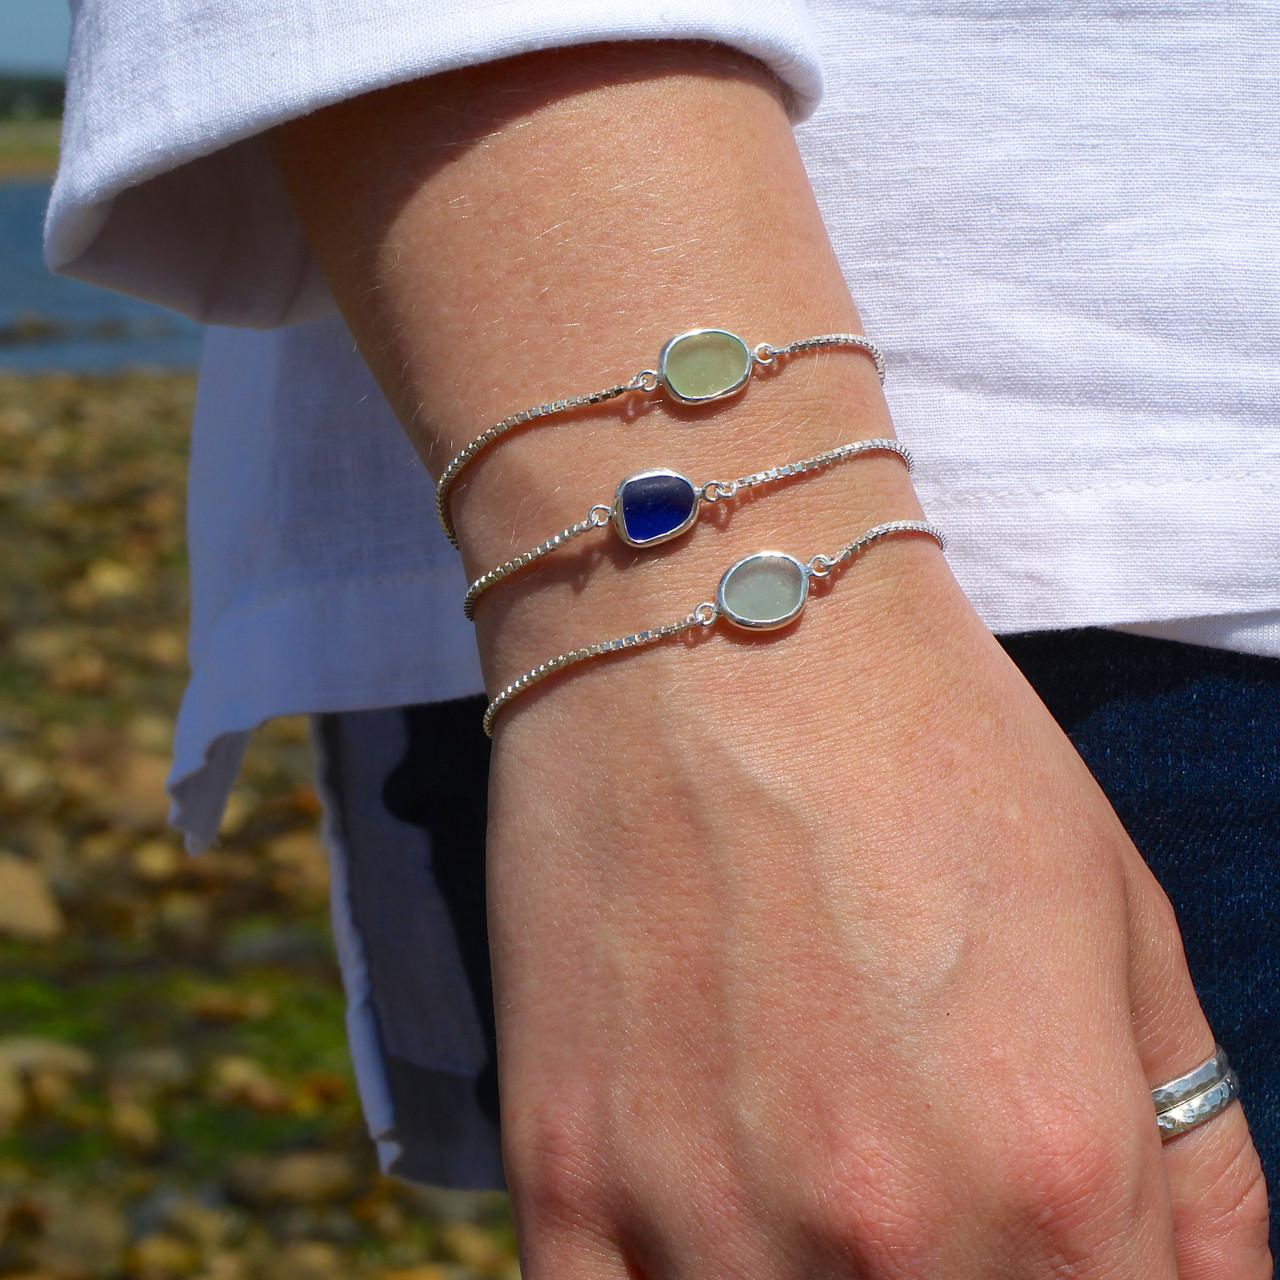 glass bead bracelet Minimalist Tie on Bracelet tie on cord bracelet tiny bead bracelet sea glass bead anklet